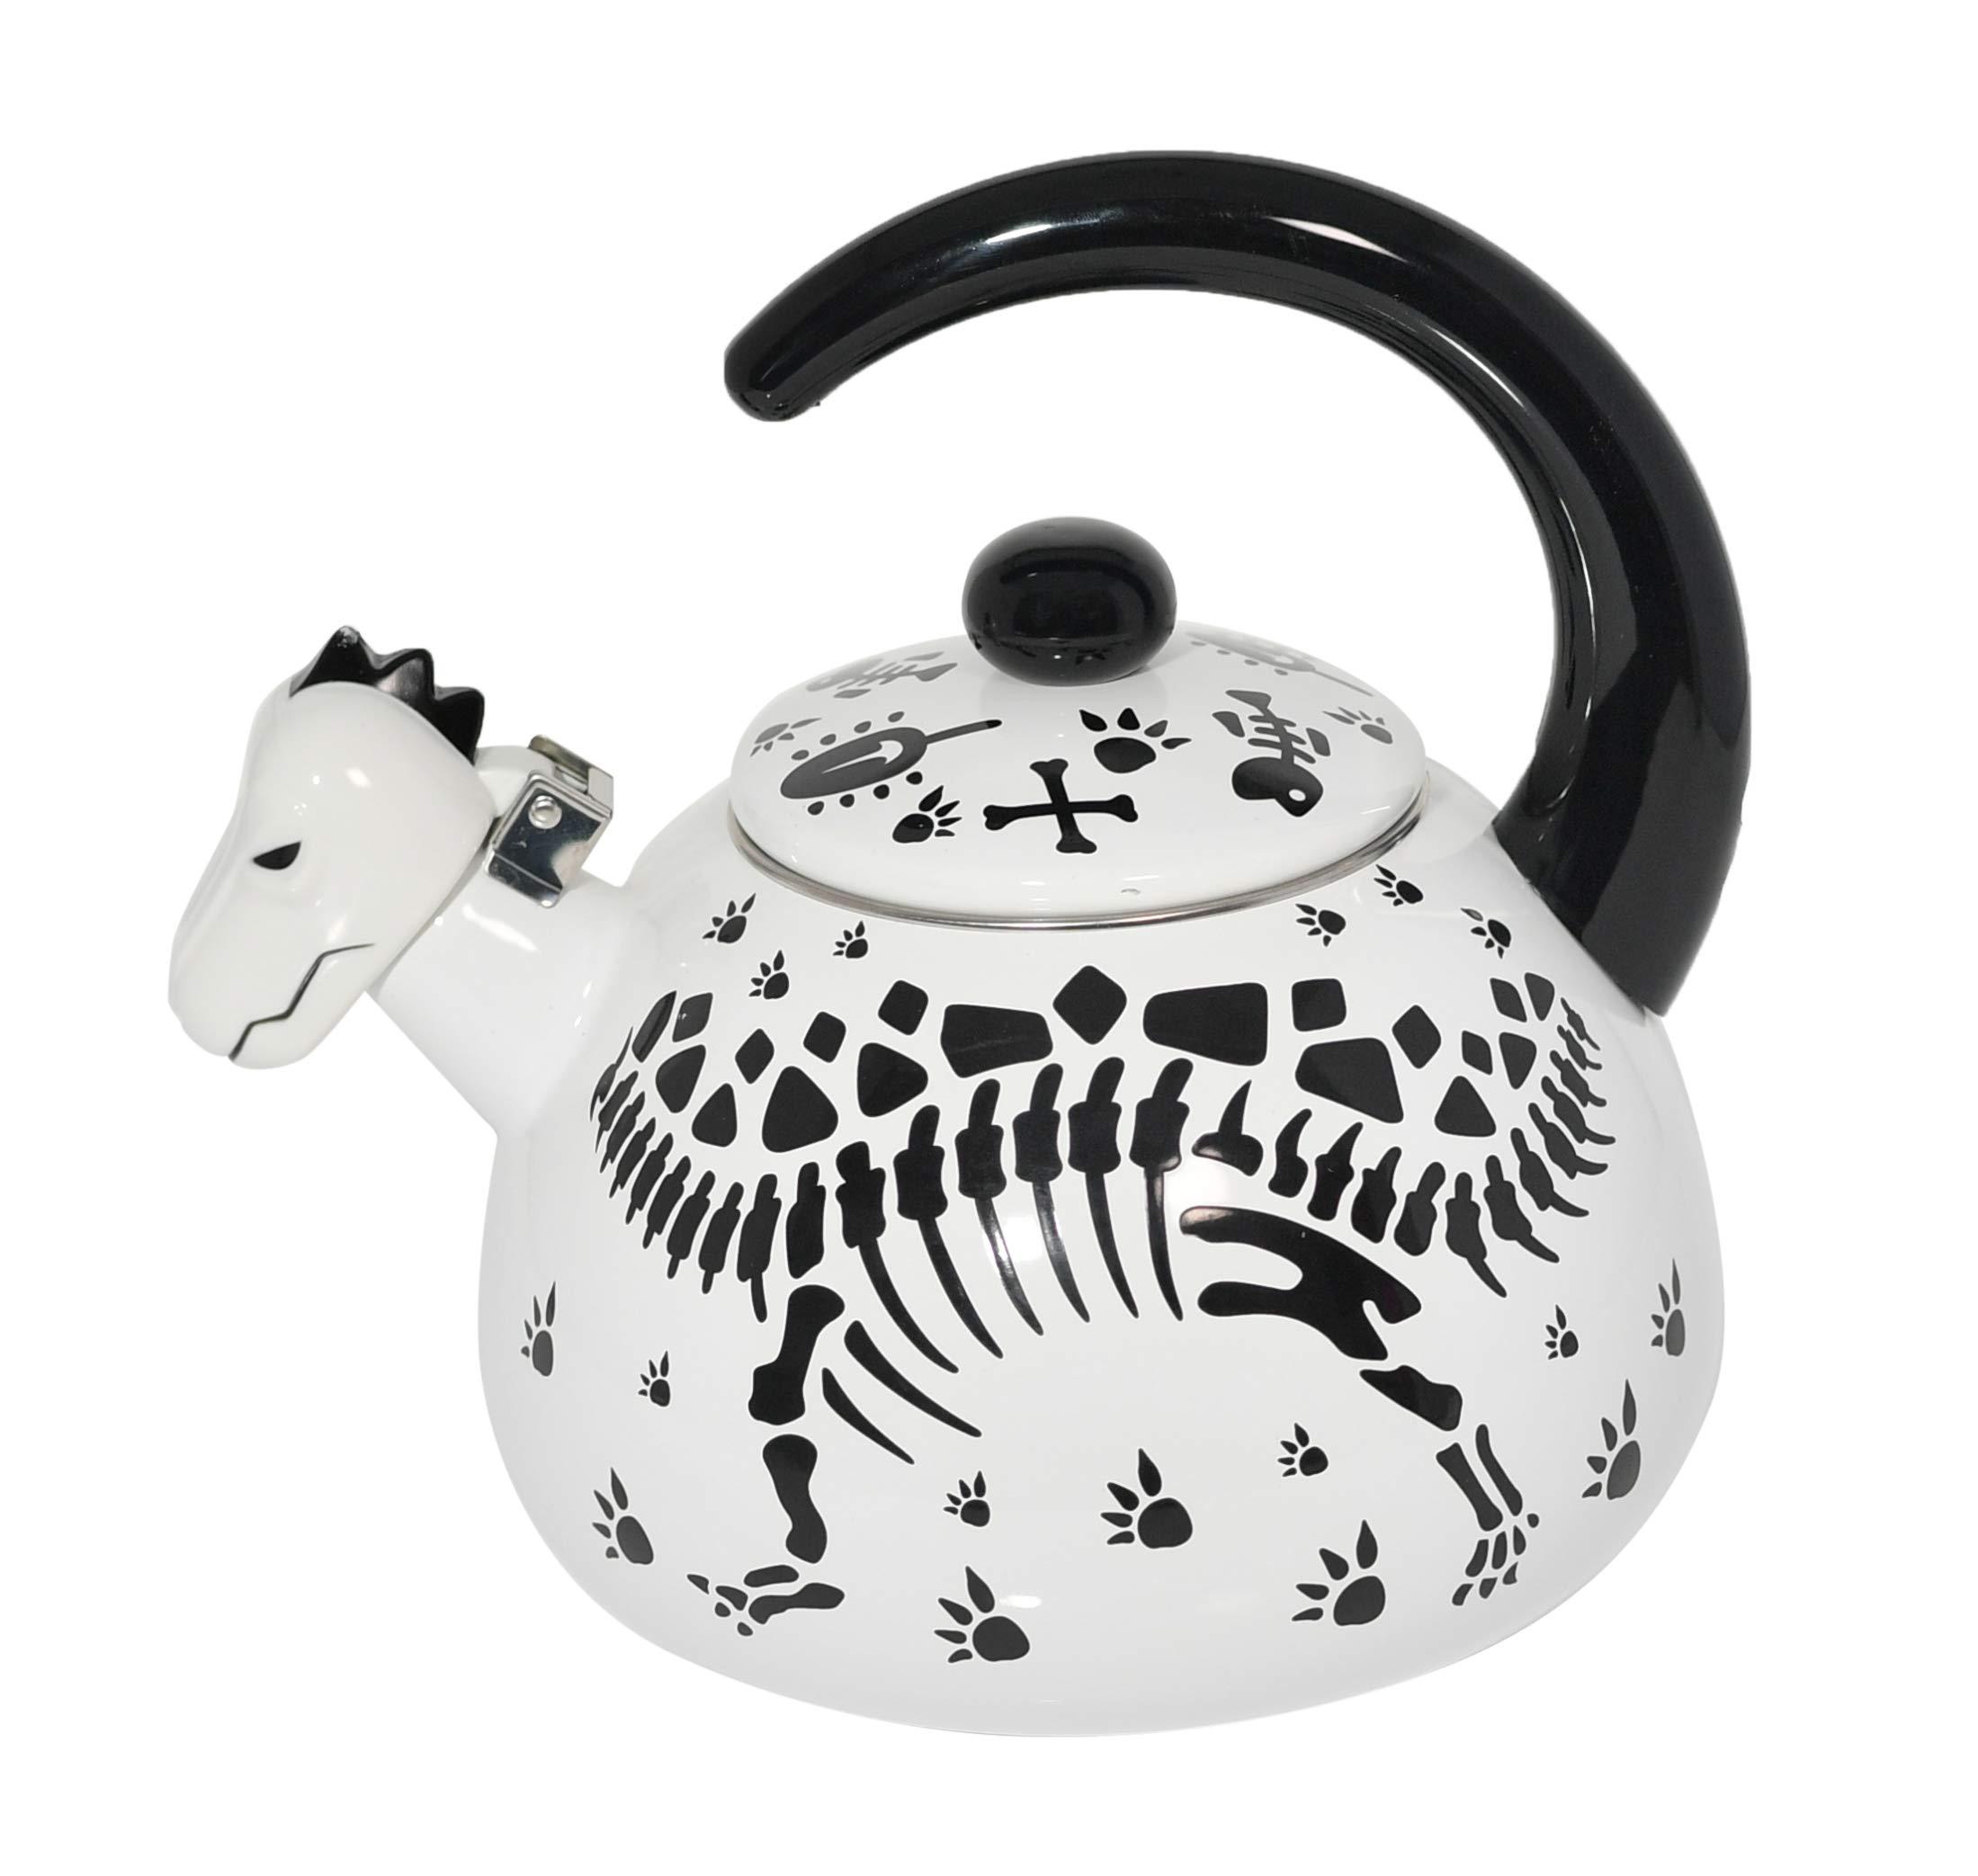 HOME-X Stegosaurius Dinosaur Whistling Tea Kettle, Cute Animal Teapot, Kitchen Accessories and Decor